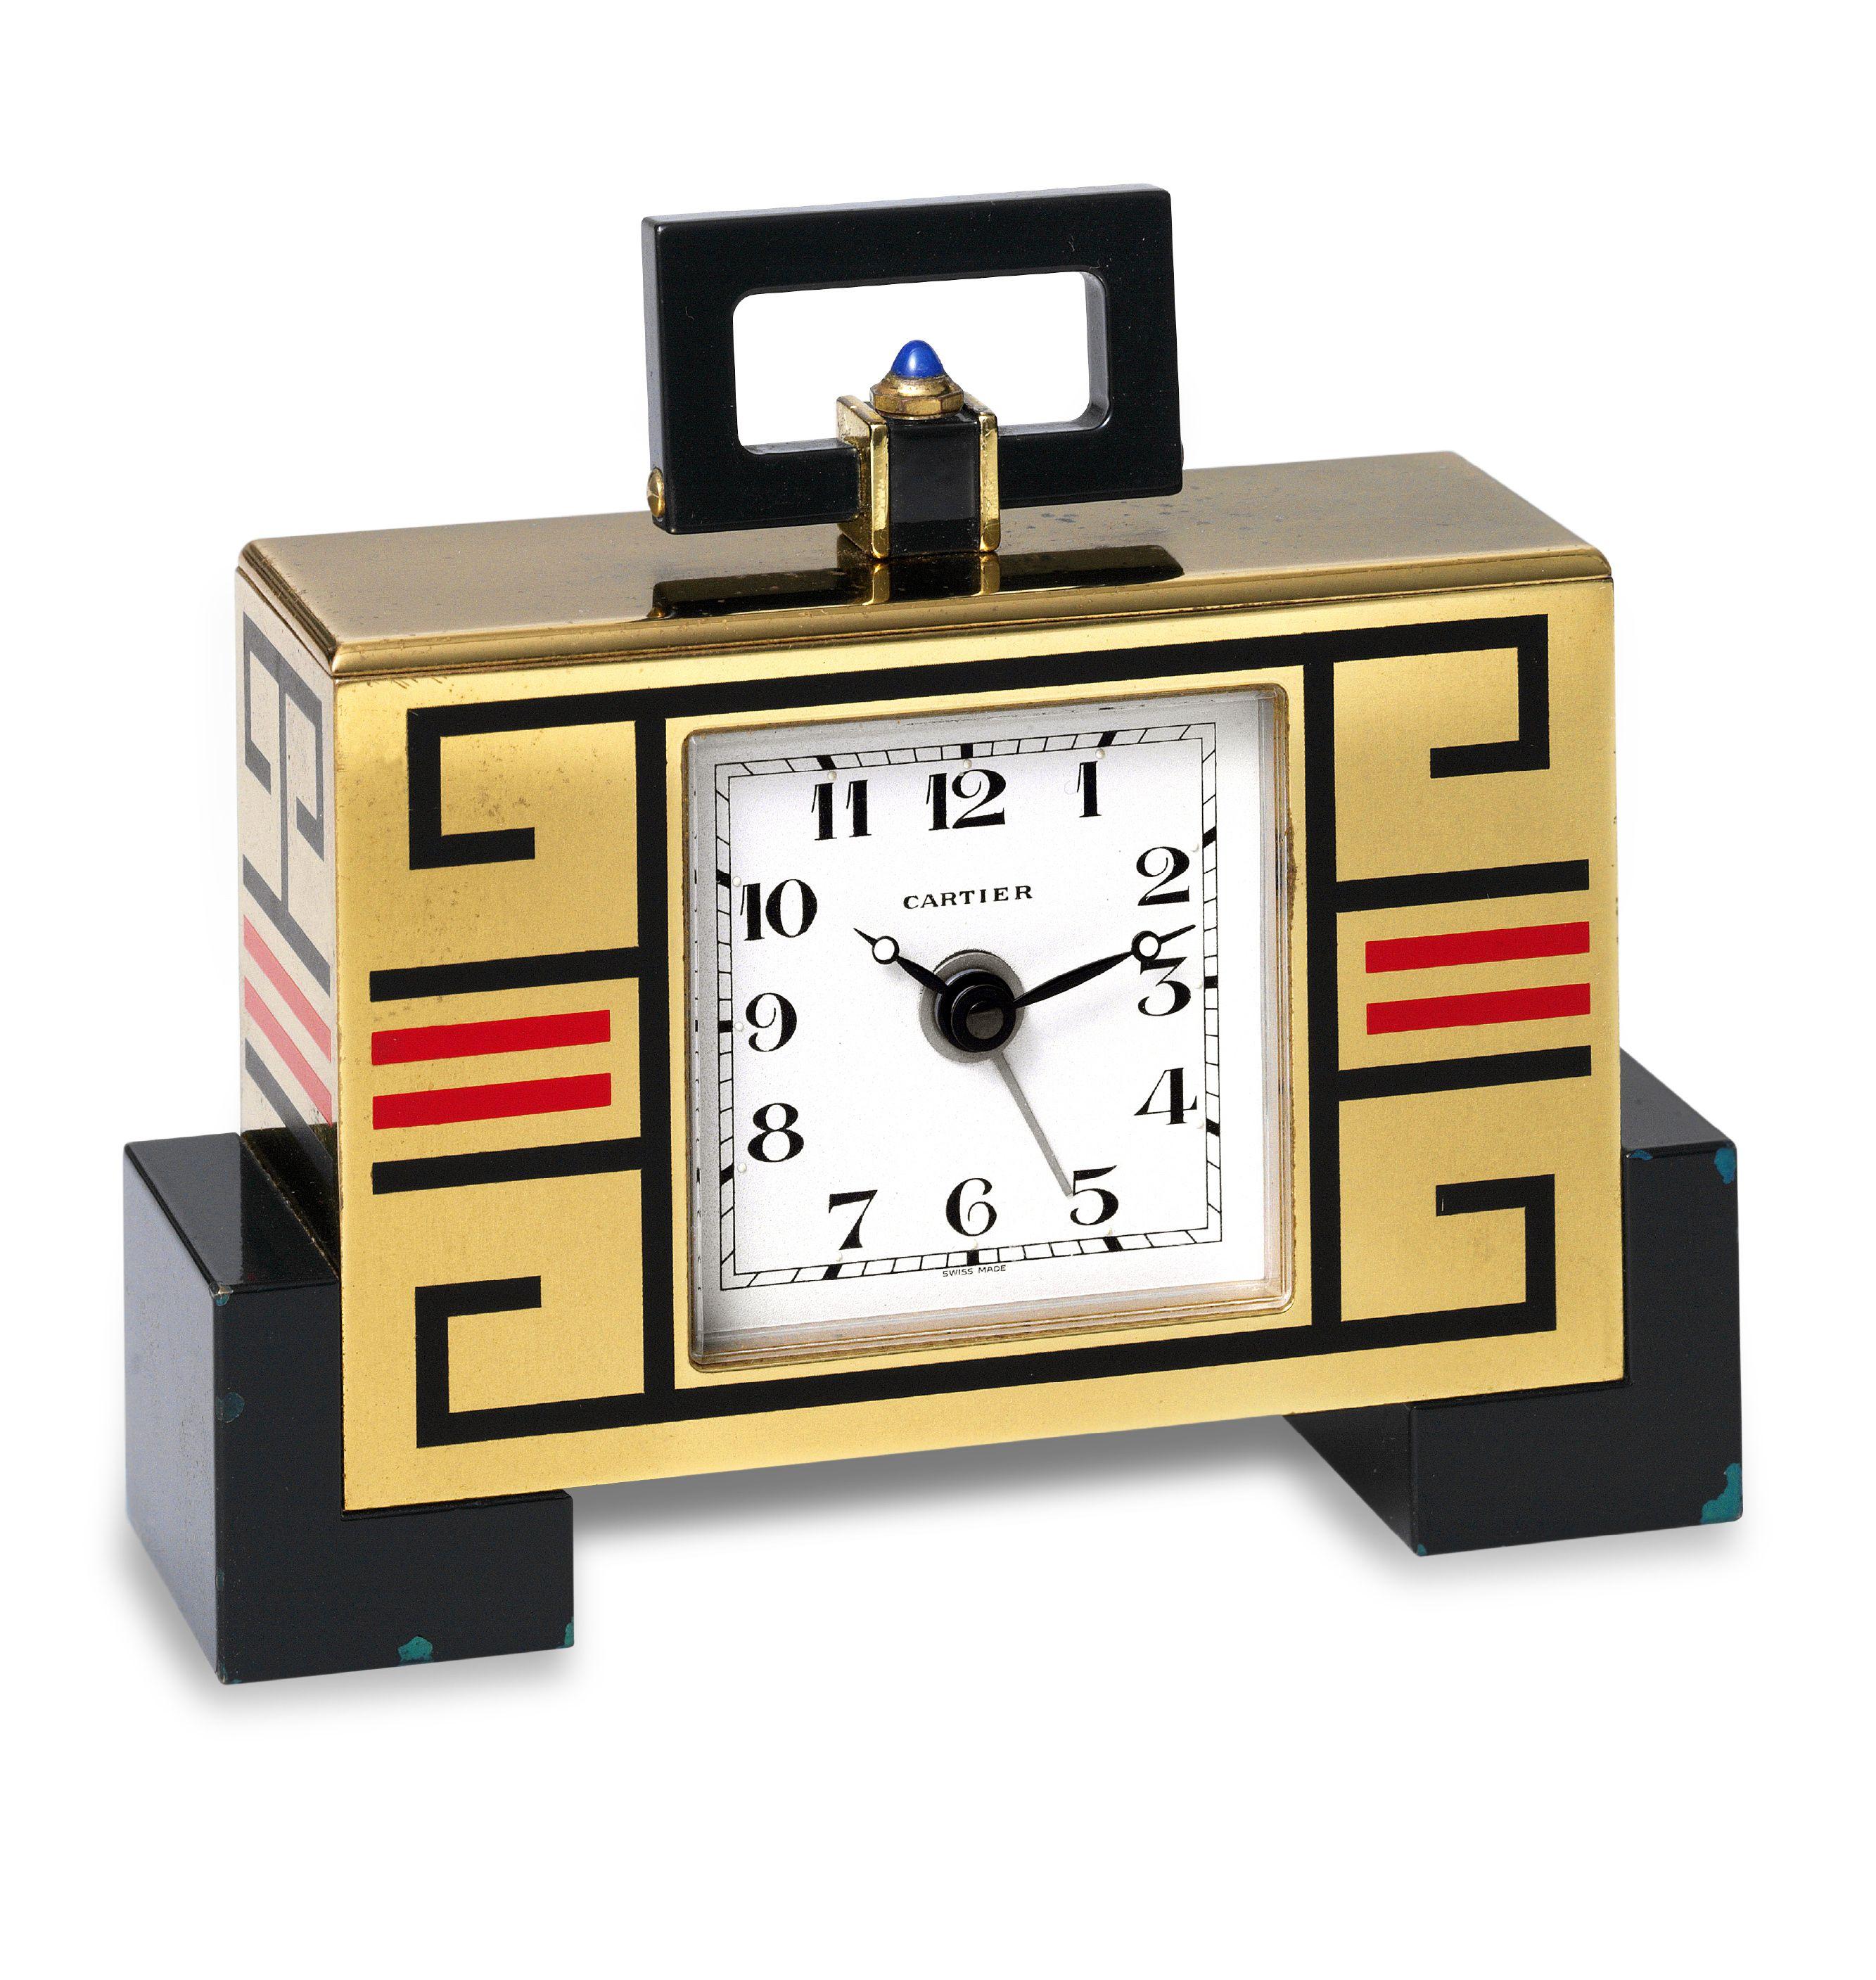 Cartier Art Deco Clock Furniture